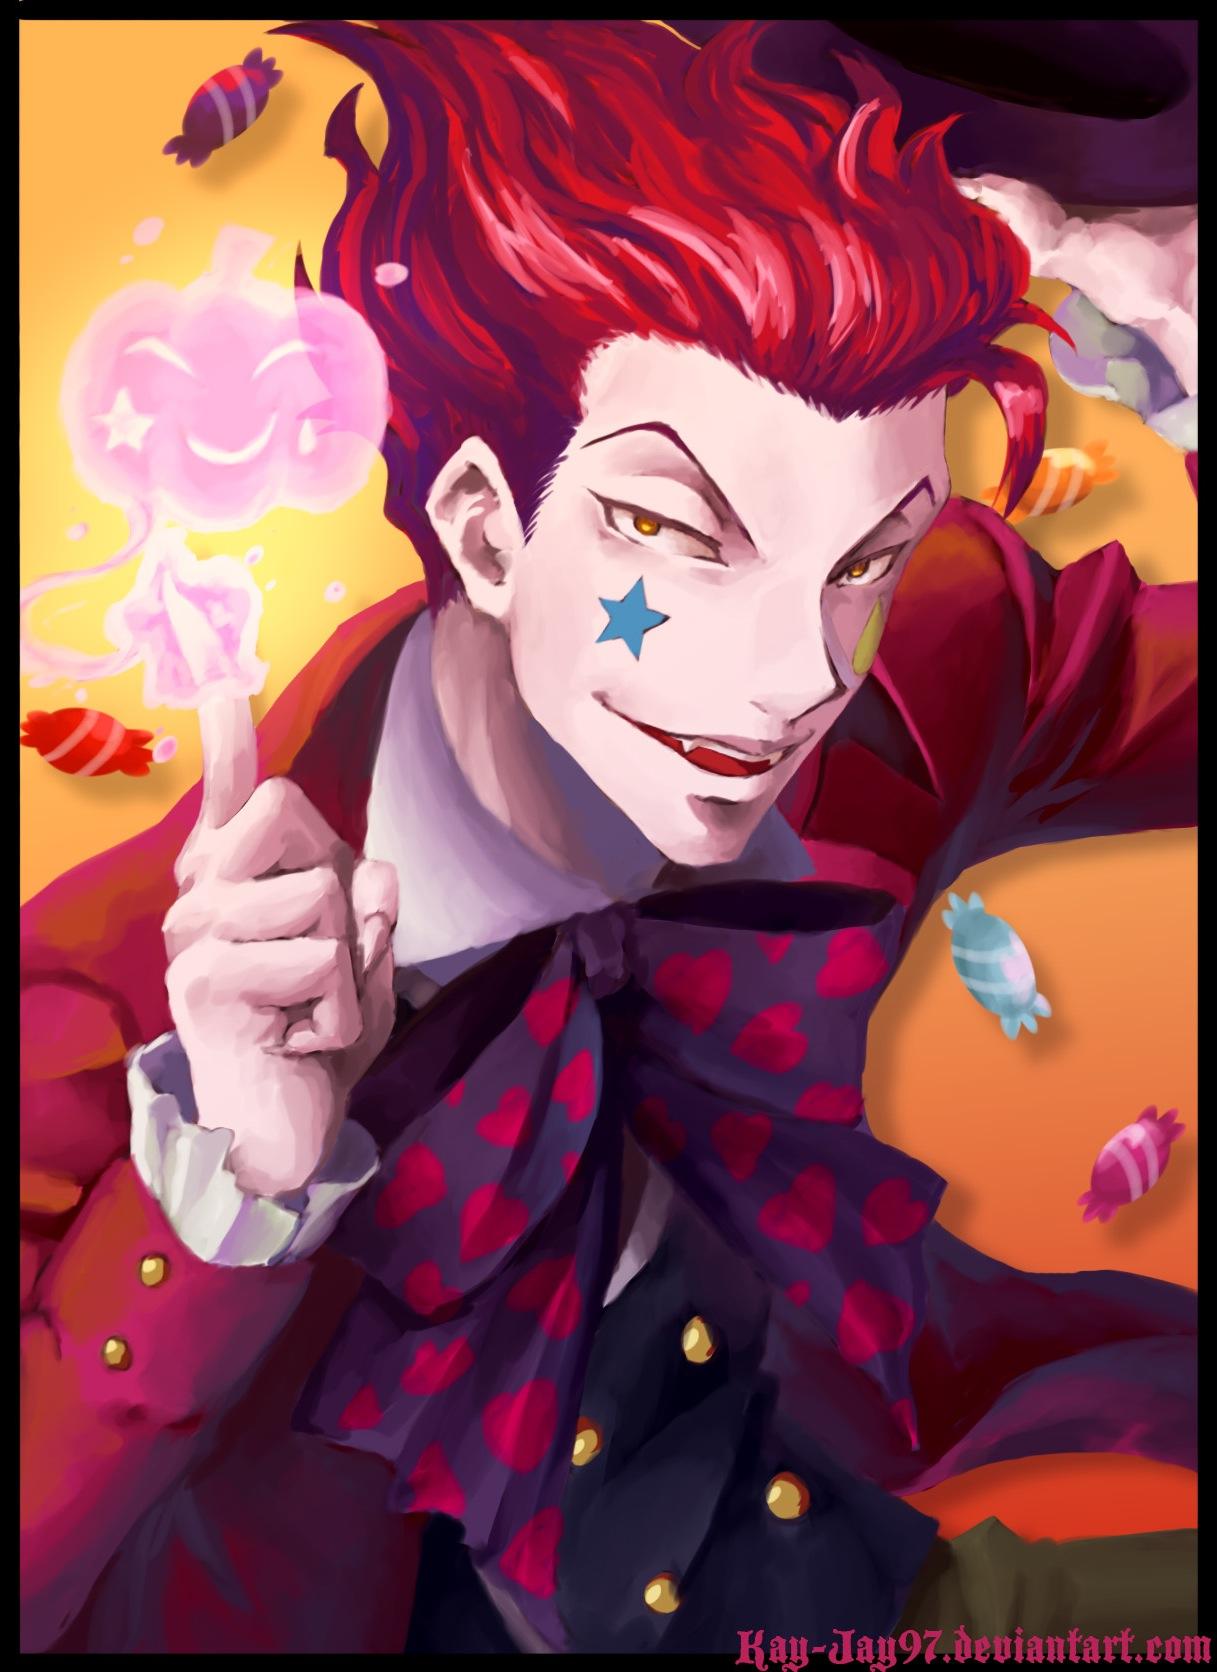 Wallpaper Anime Hunter X Hunter Hisoka Hunter X Hunter Page 4 Of 11 Zerochan Anime